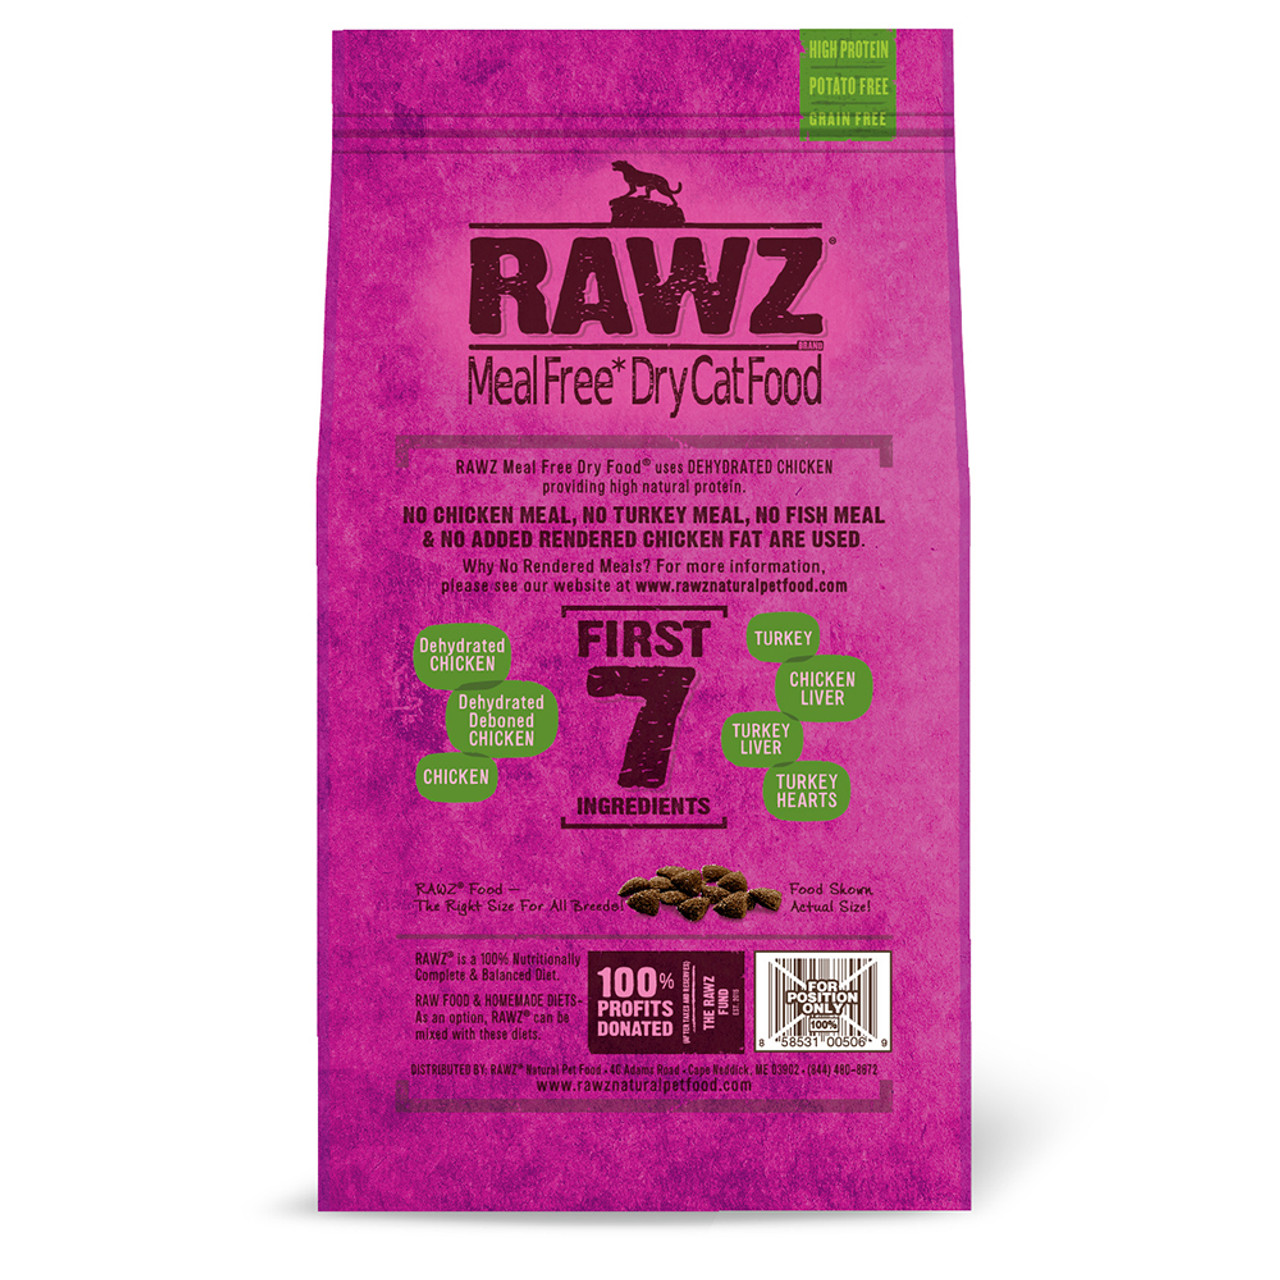 RAWZ Dehydrated Chicken, Turkey & Chicken Recipe Natural Dry Cat Food